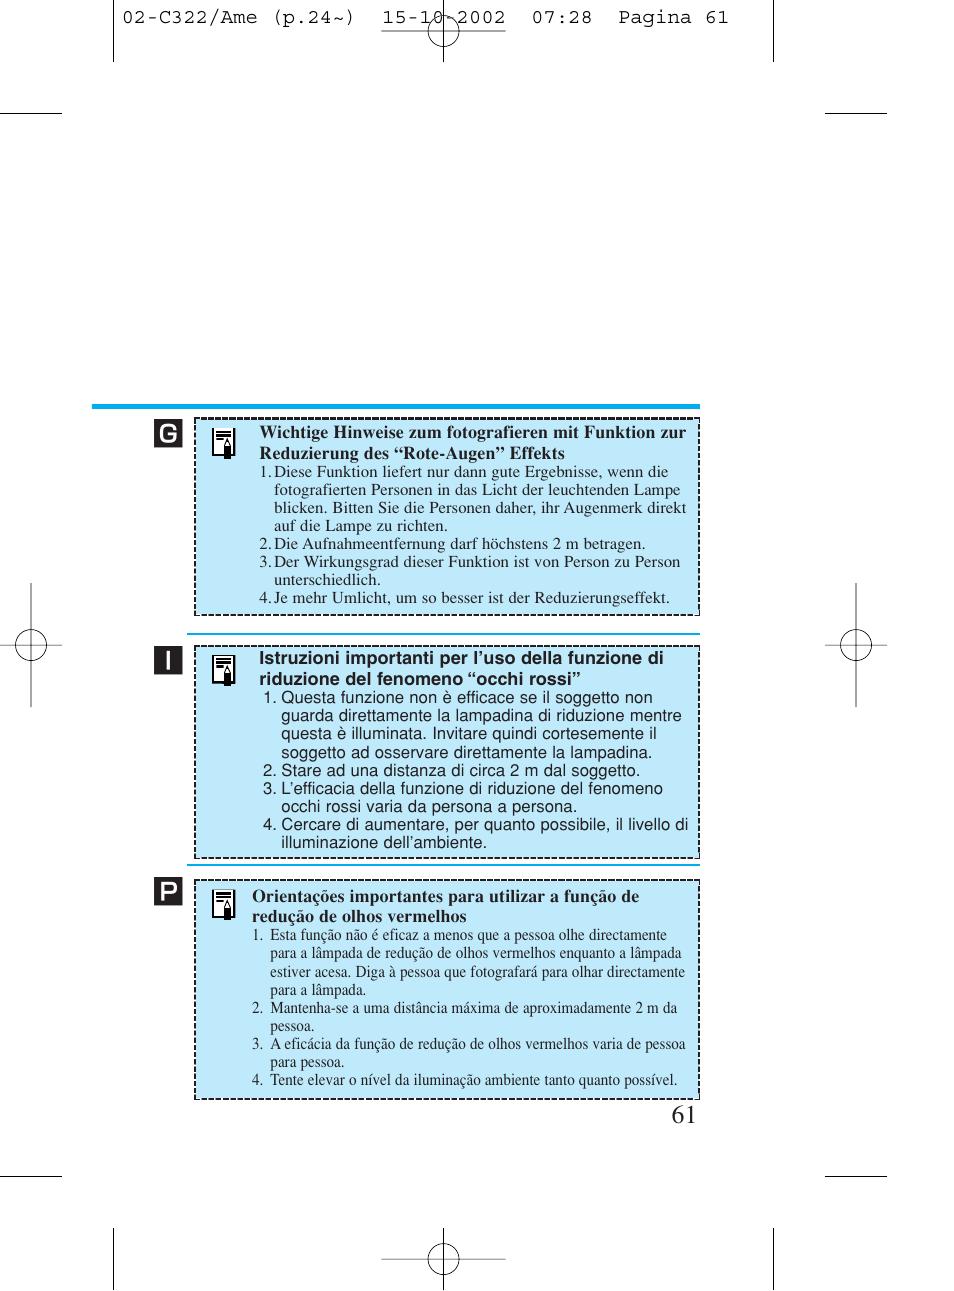 canon prima bf 80 set user manual page 61 115 original mode rh manualsdir com oster primalatte user manual prima lpr730 user manual